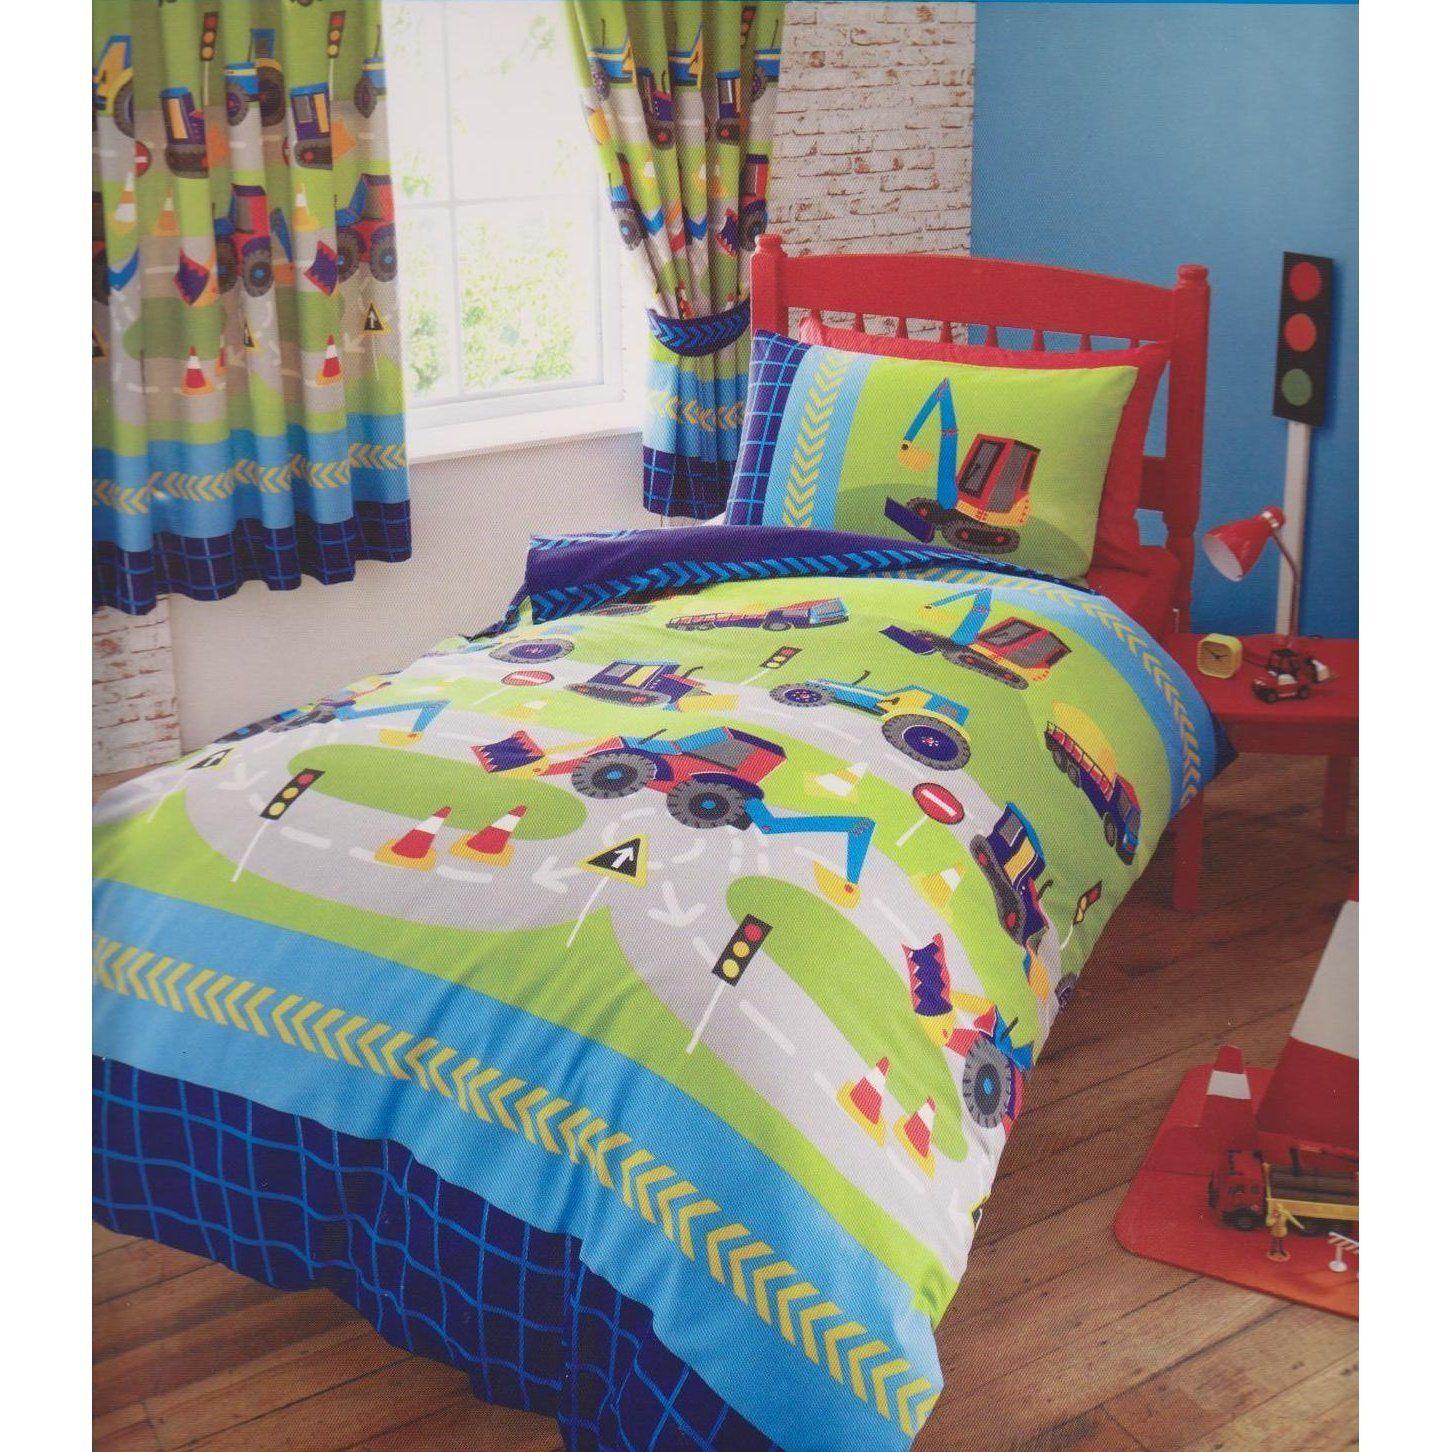 Childrens boys girls double bed duvet set new diggers bedding ... : single bed quilt sets - Adamdwight.com